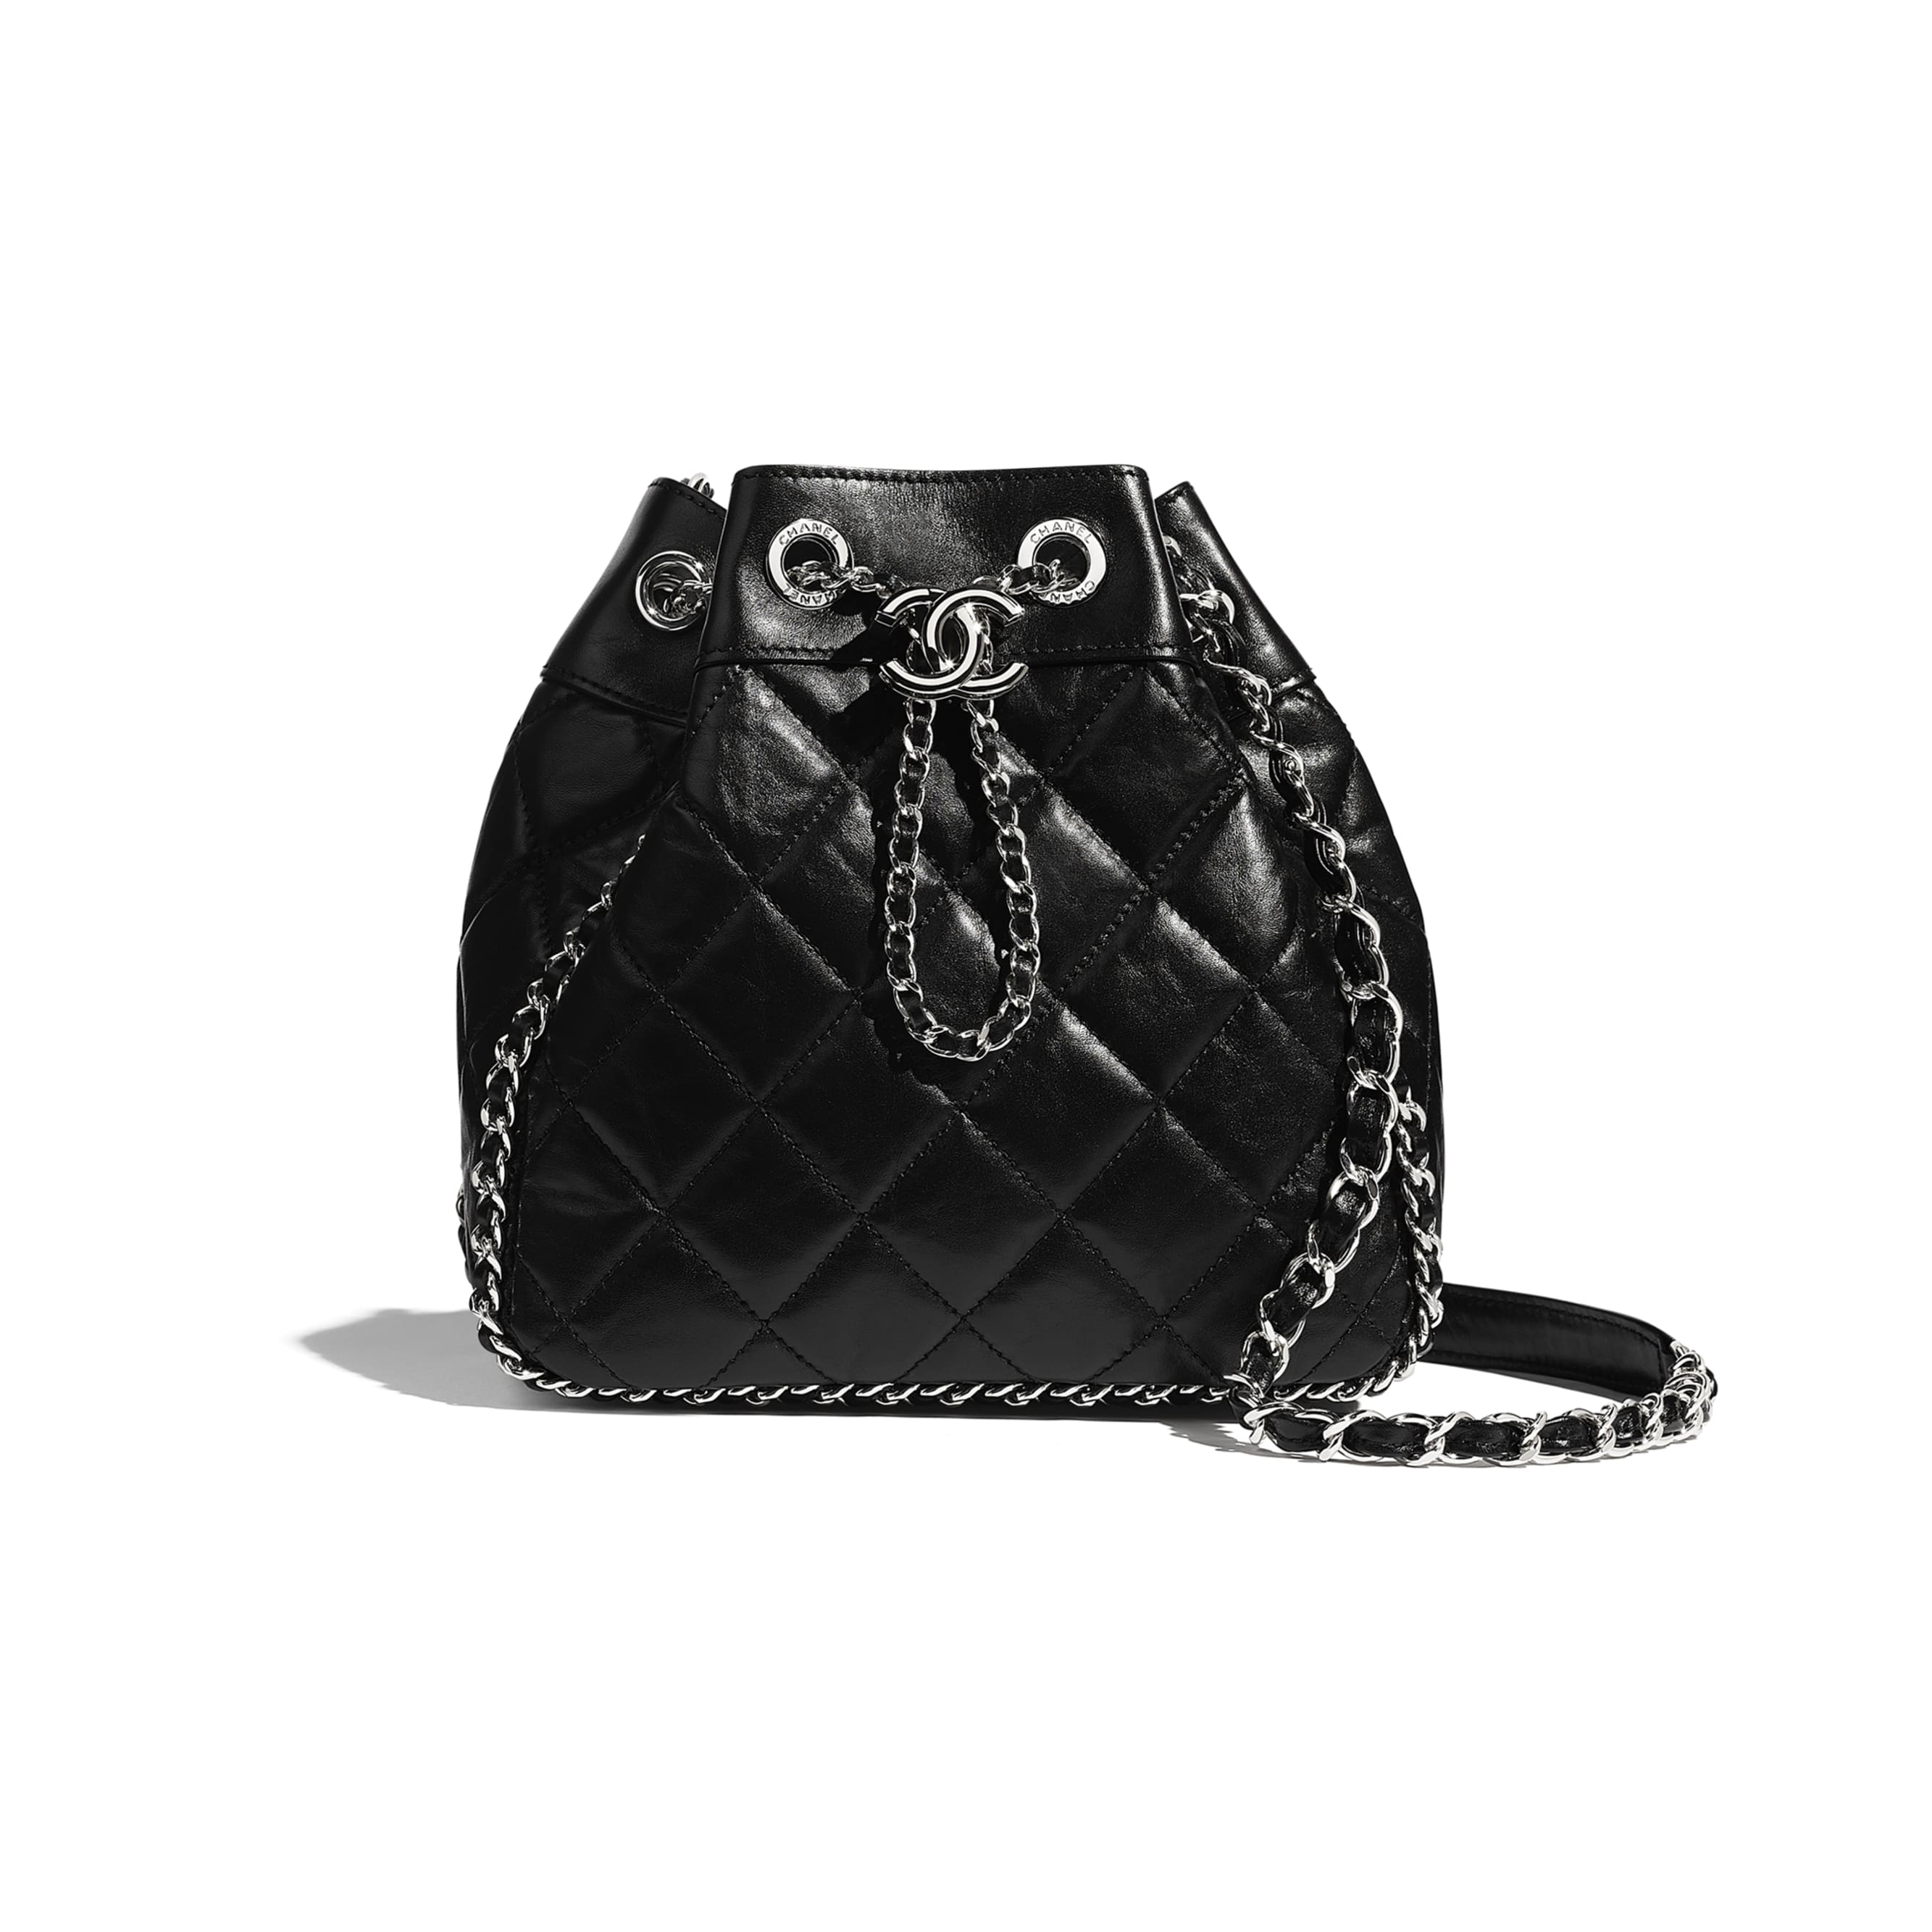 Drawstring Bag - Black - Aged Calfskin & Silver-Tone Metal - CHANEL - Default view - see standard sized version